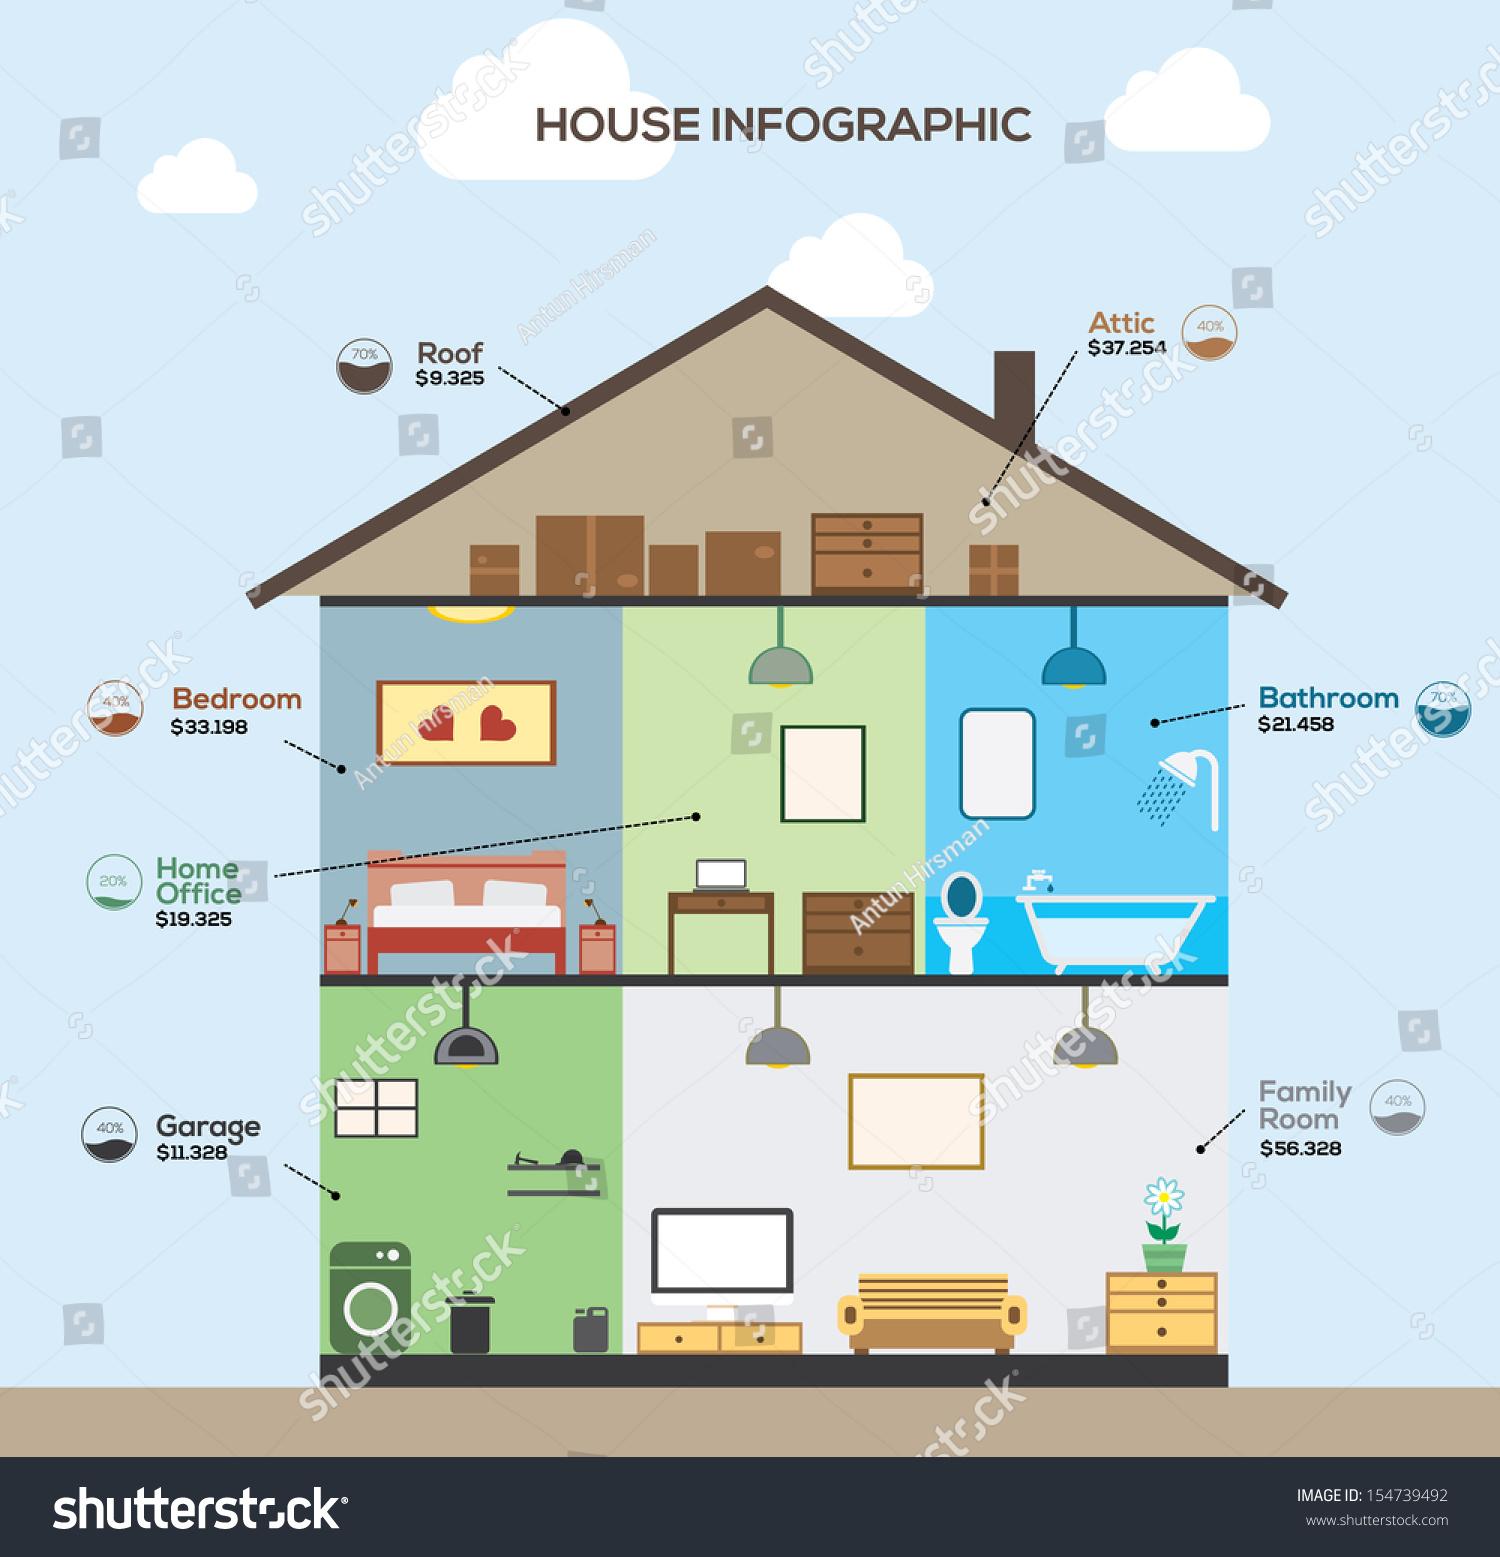 set elements of infographics house design 154739492 larastock set elements of infographics house design